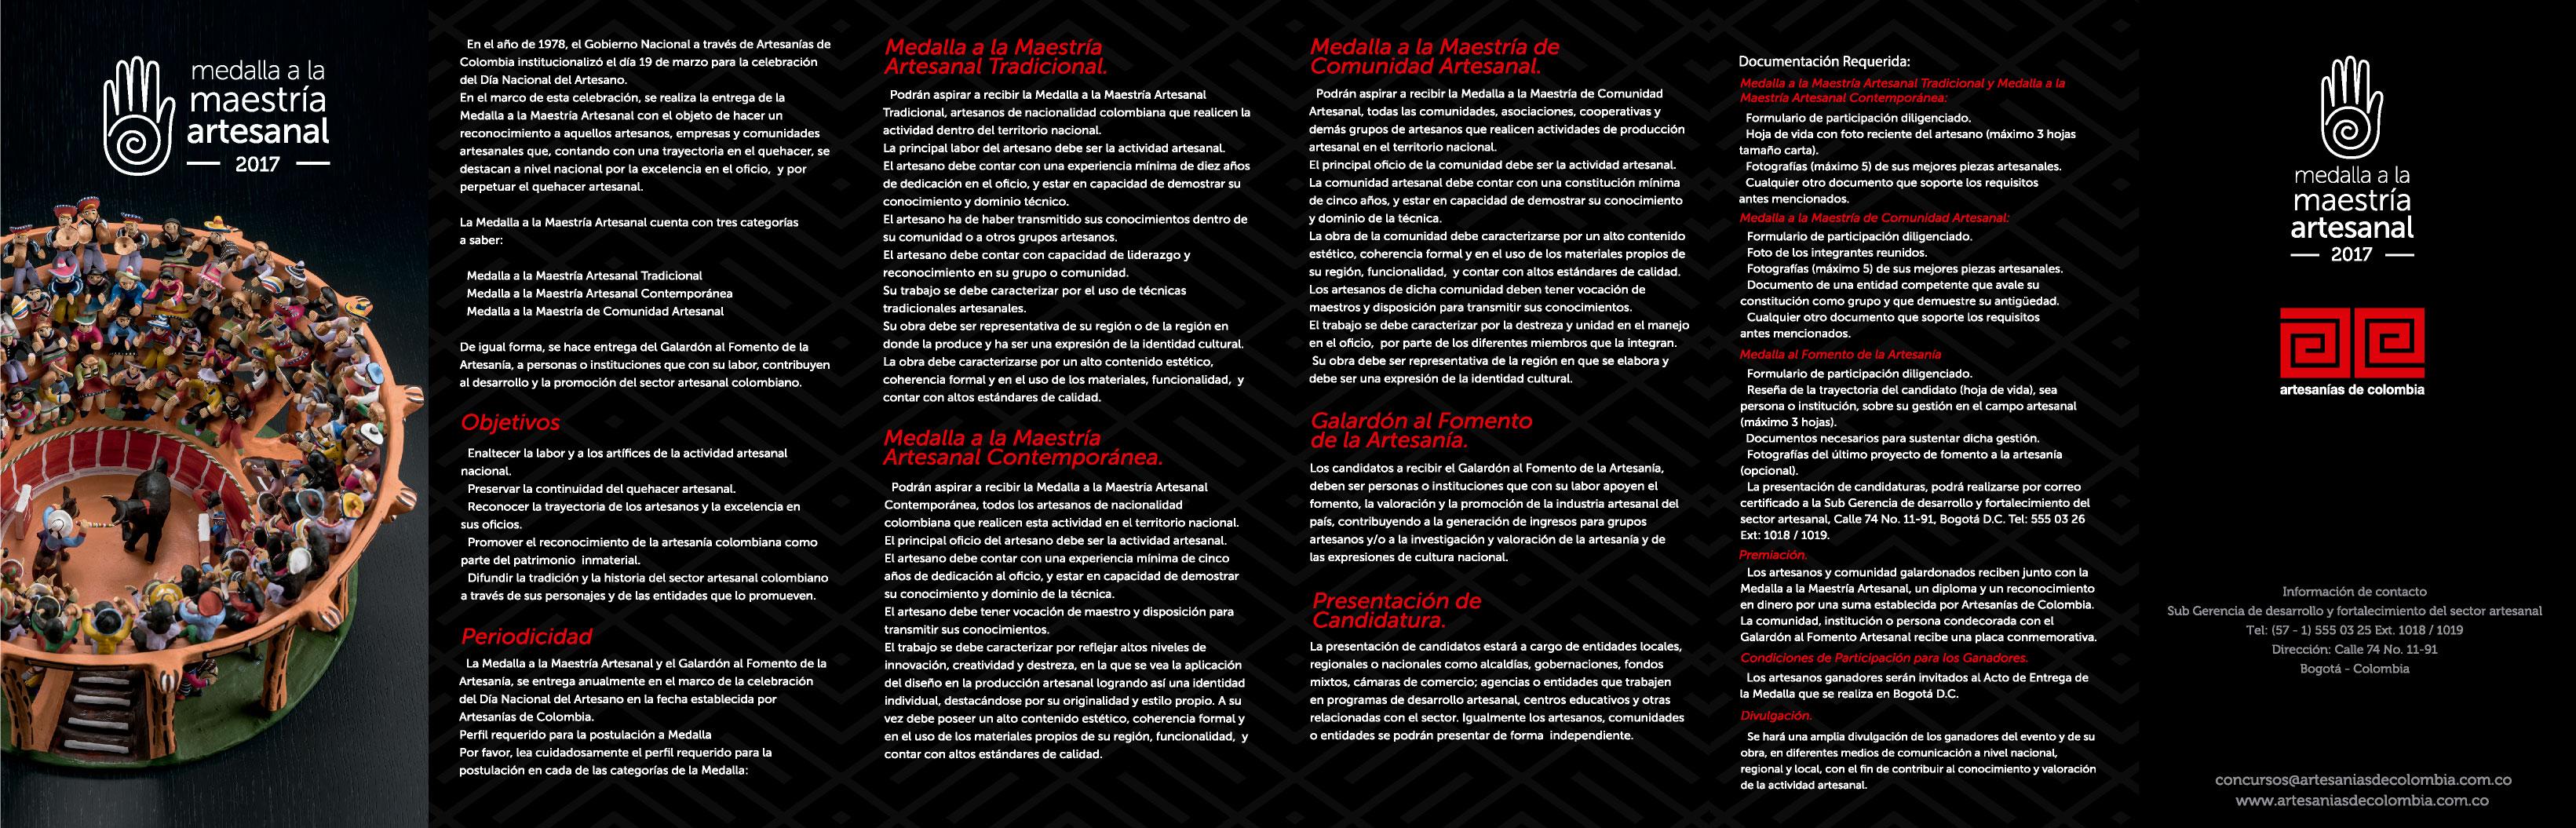 http://artesaniasdecolombia.com.co/PortalAC/images/Plegable-convocatoria-medalla-2017.jpg